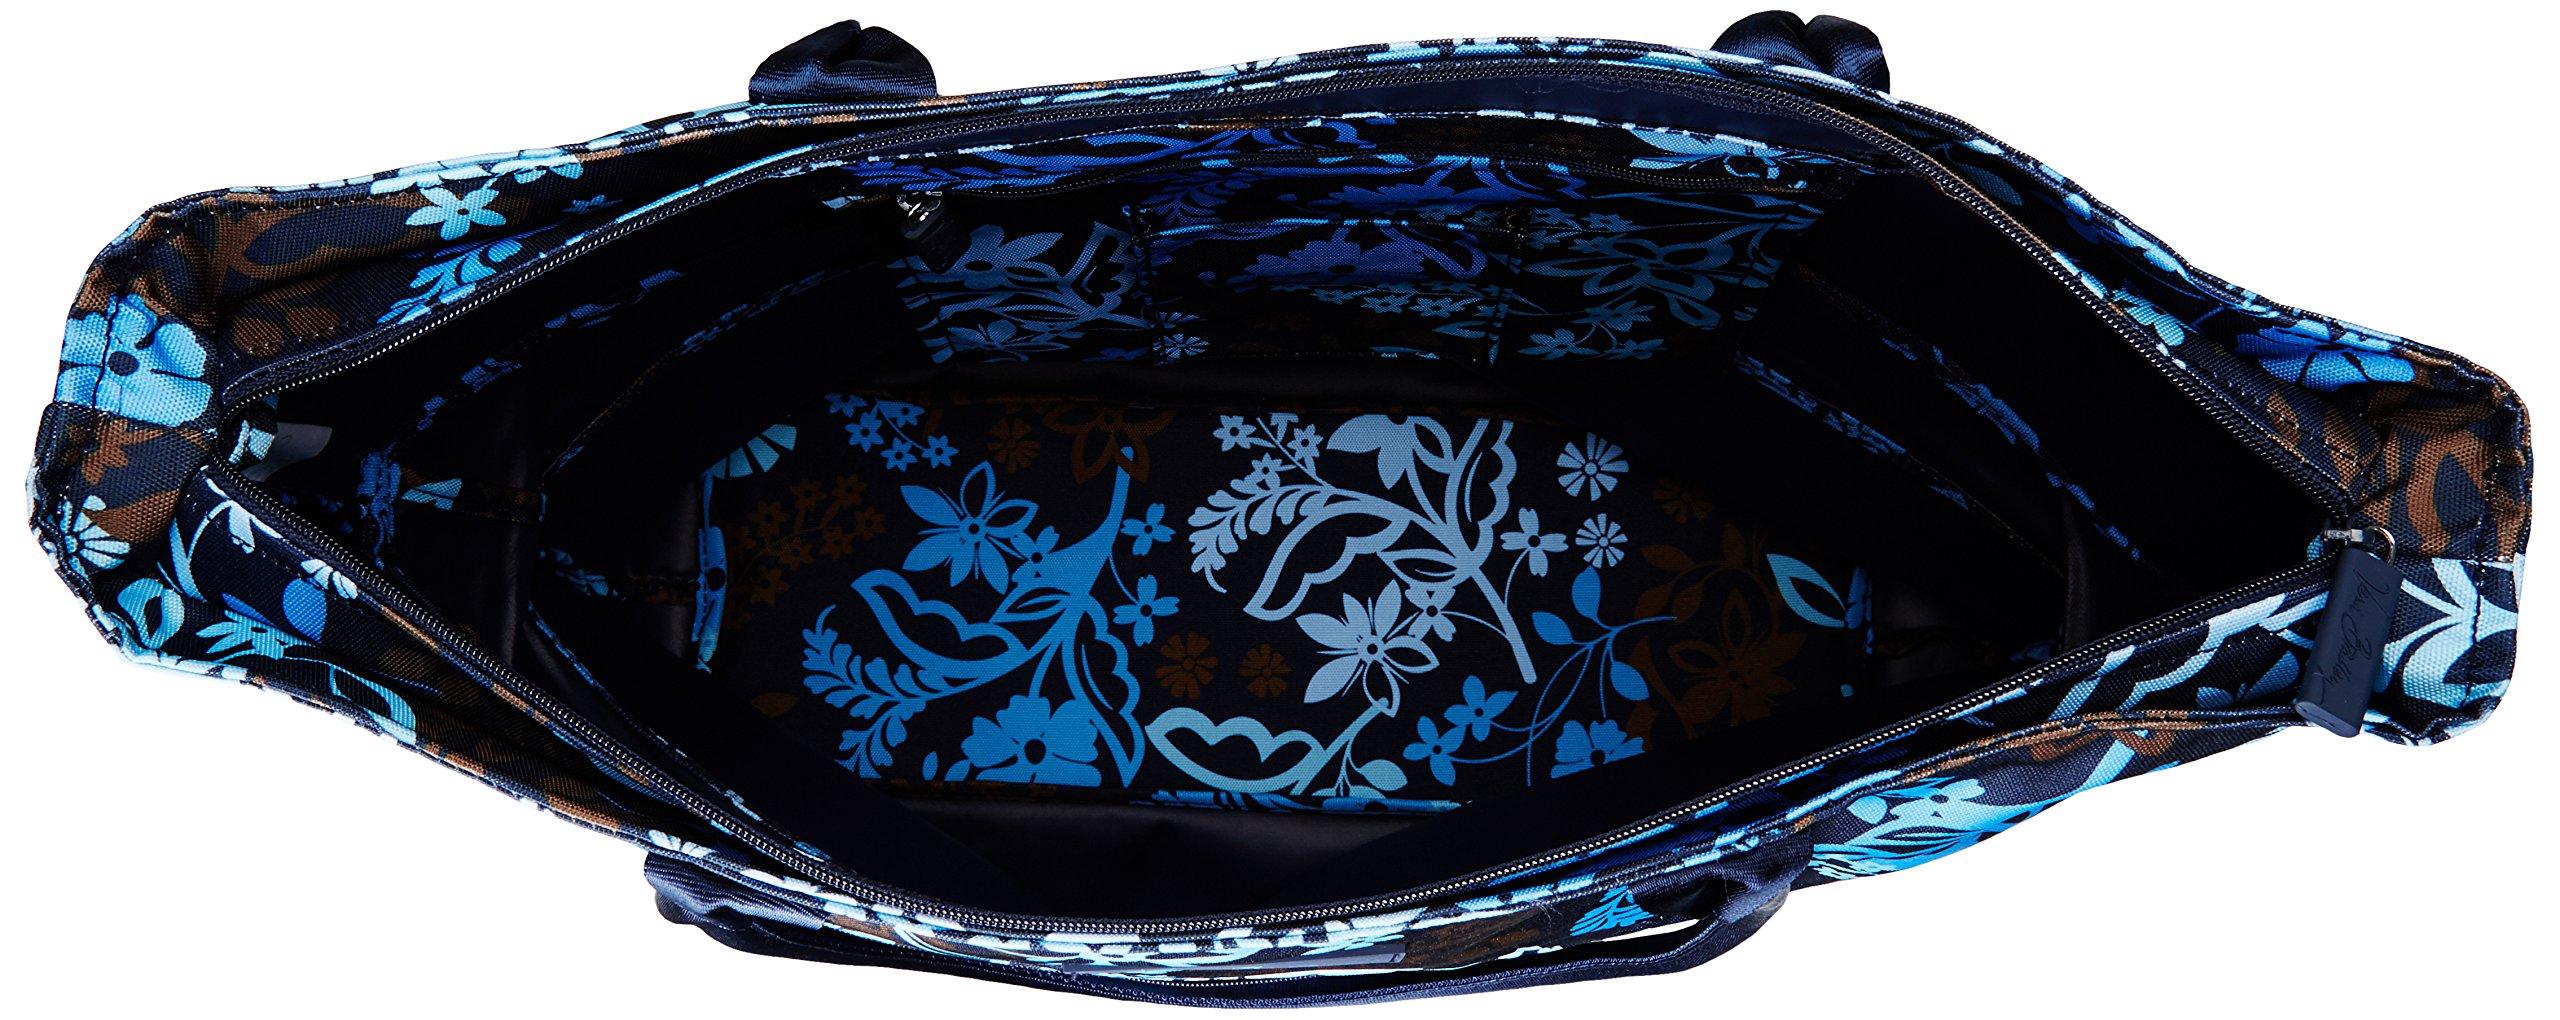 Vera Bradley Women's Lighten up Expandable Travel Tote, Java Floral by Vera Bradley (Image #5)